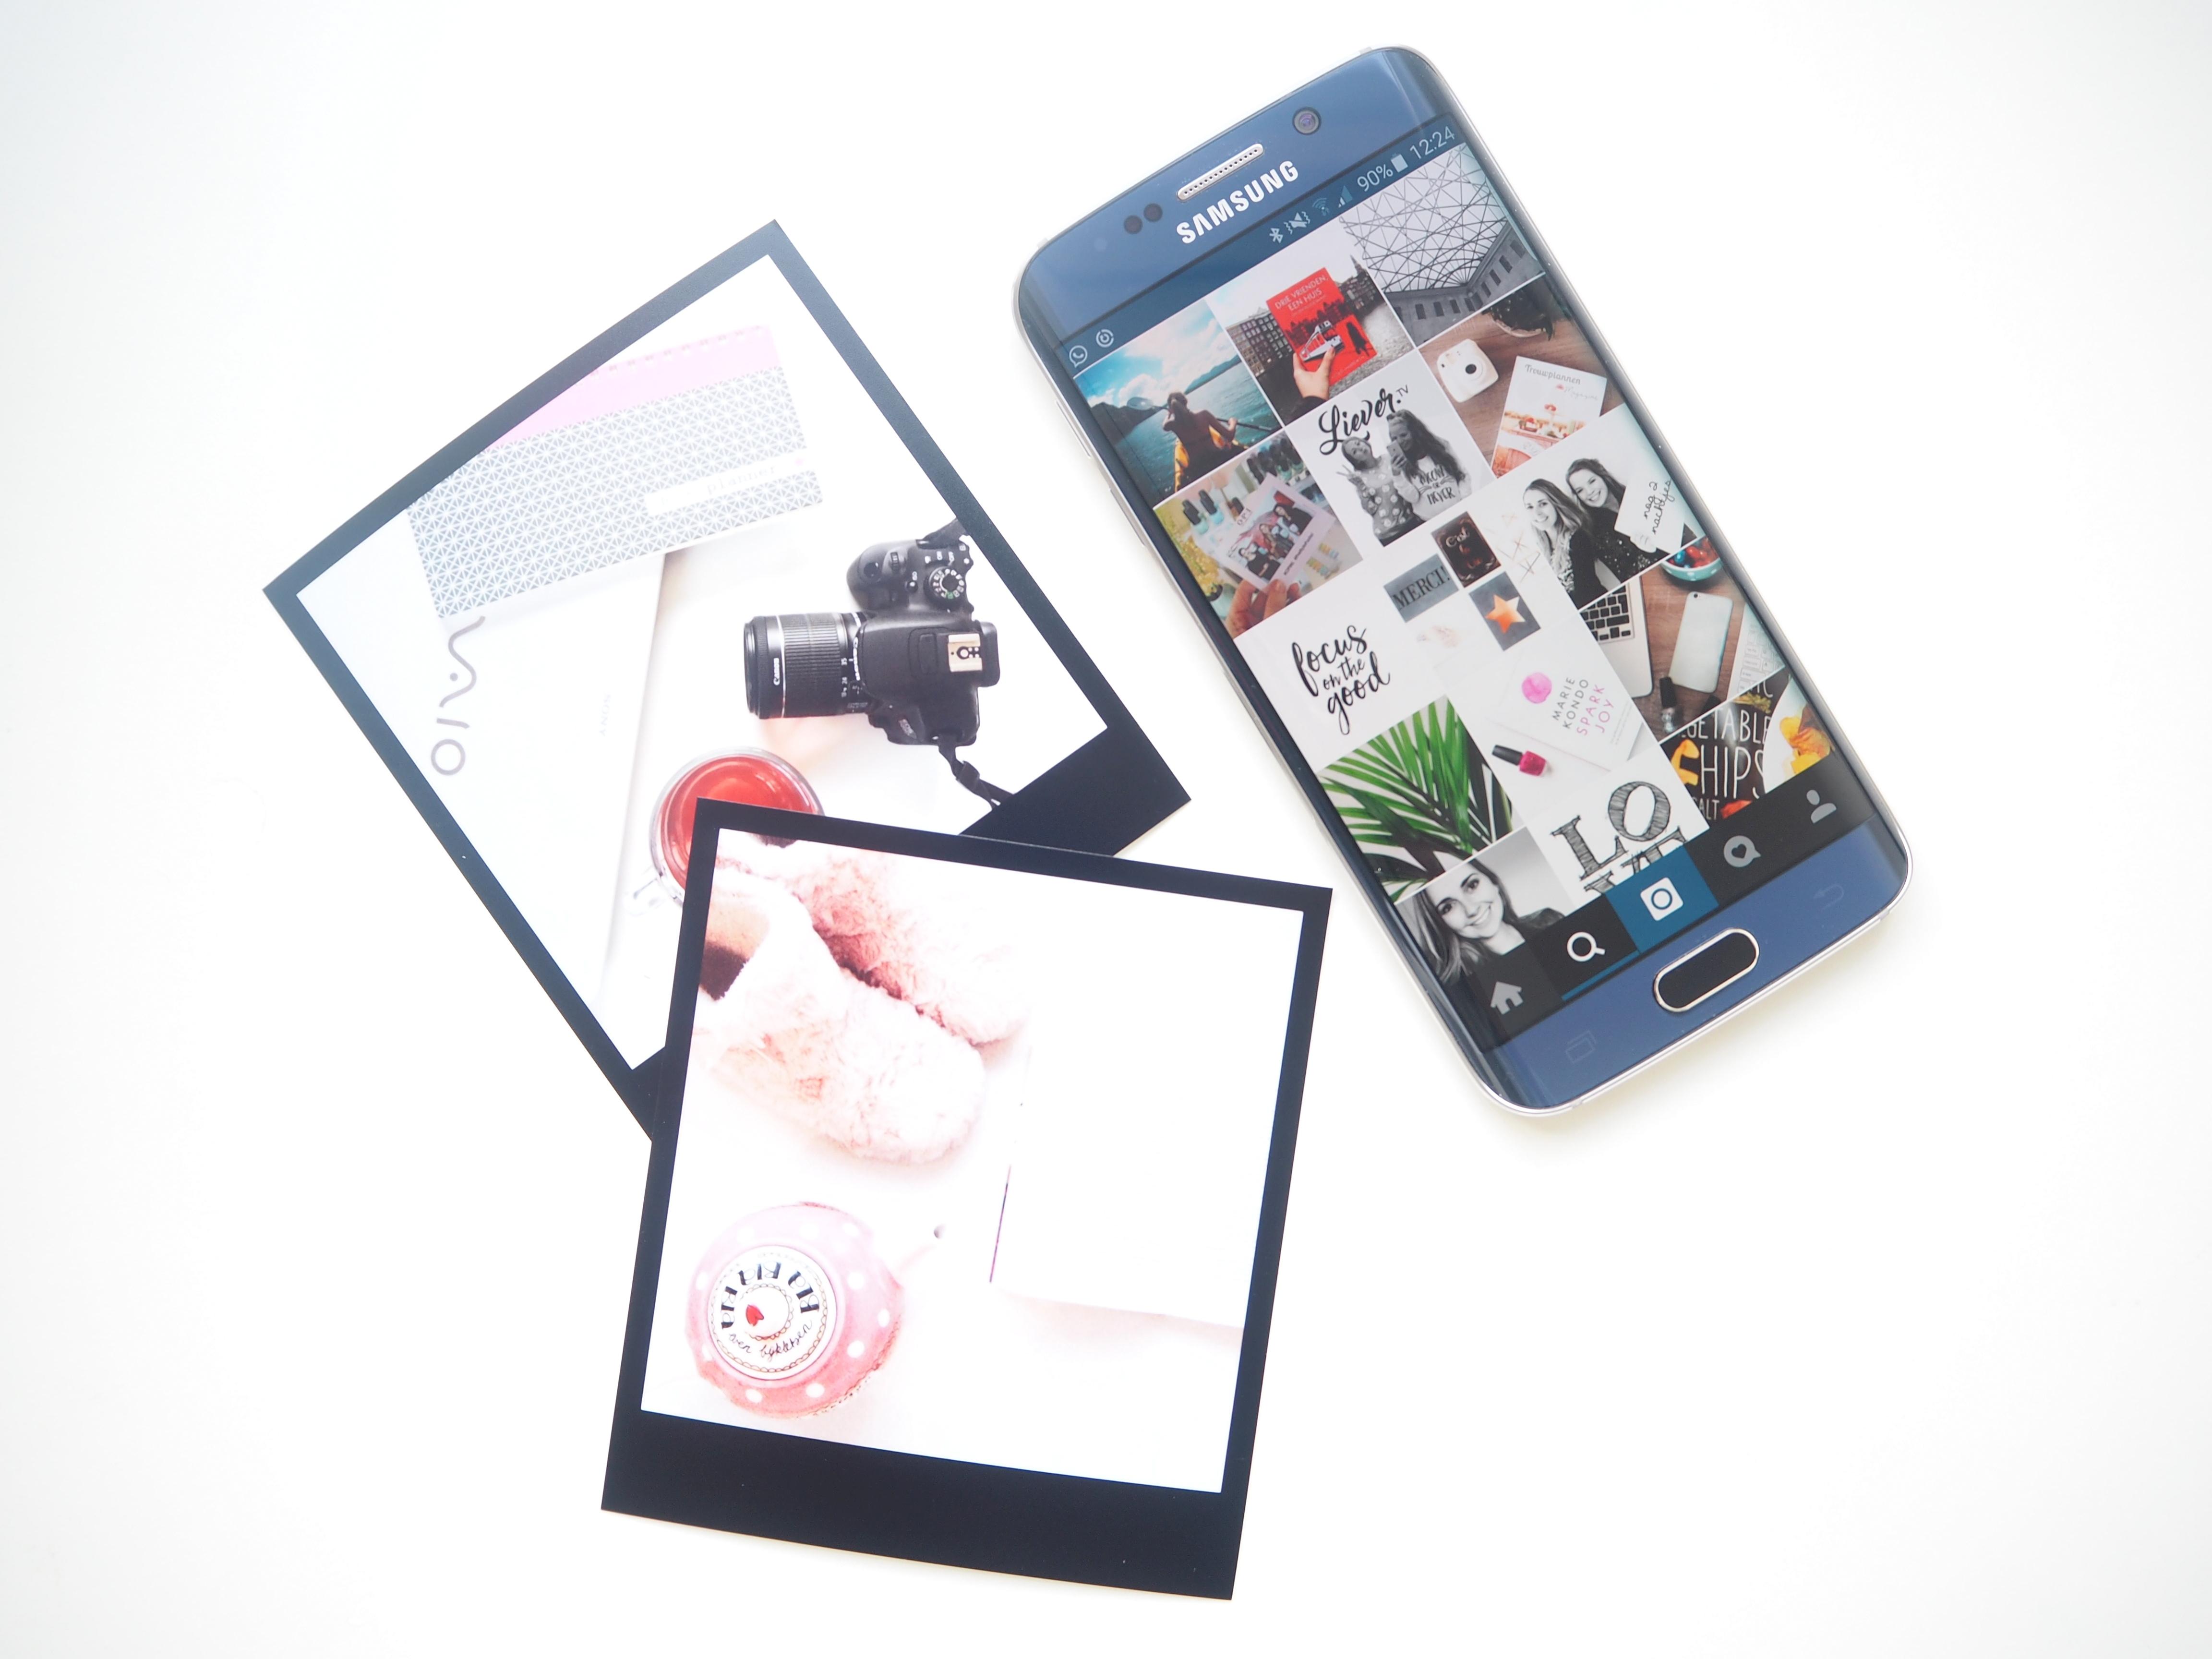 Hoera, mijn nieuwe telefoon Samsung Galaxy S6 Edge